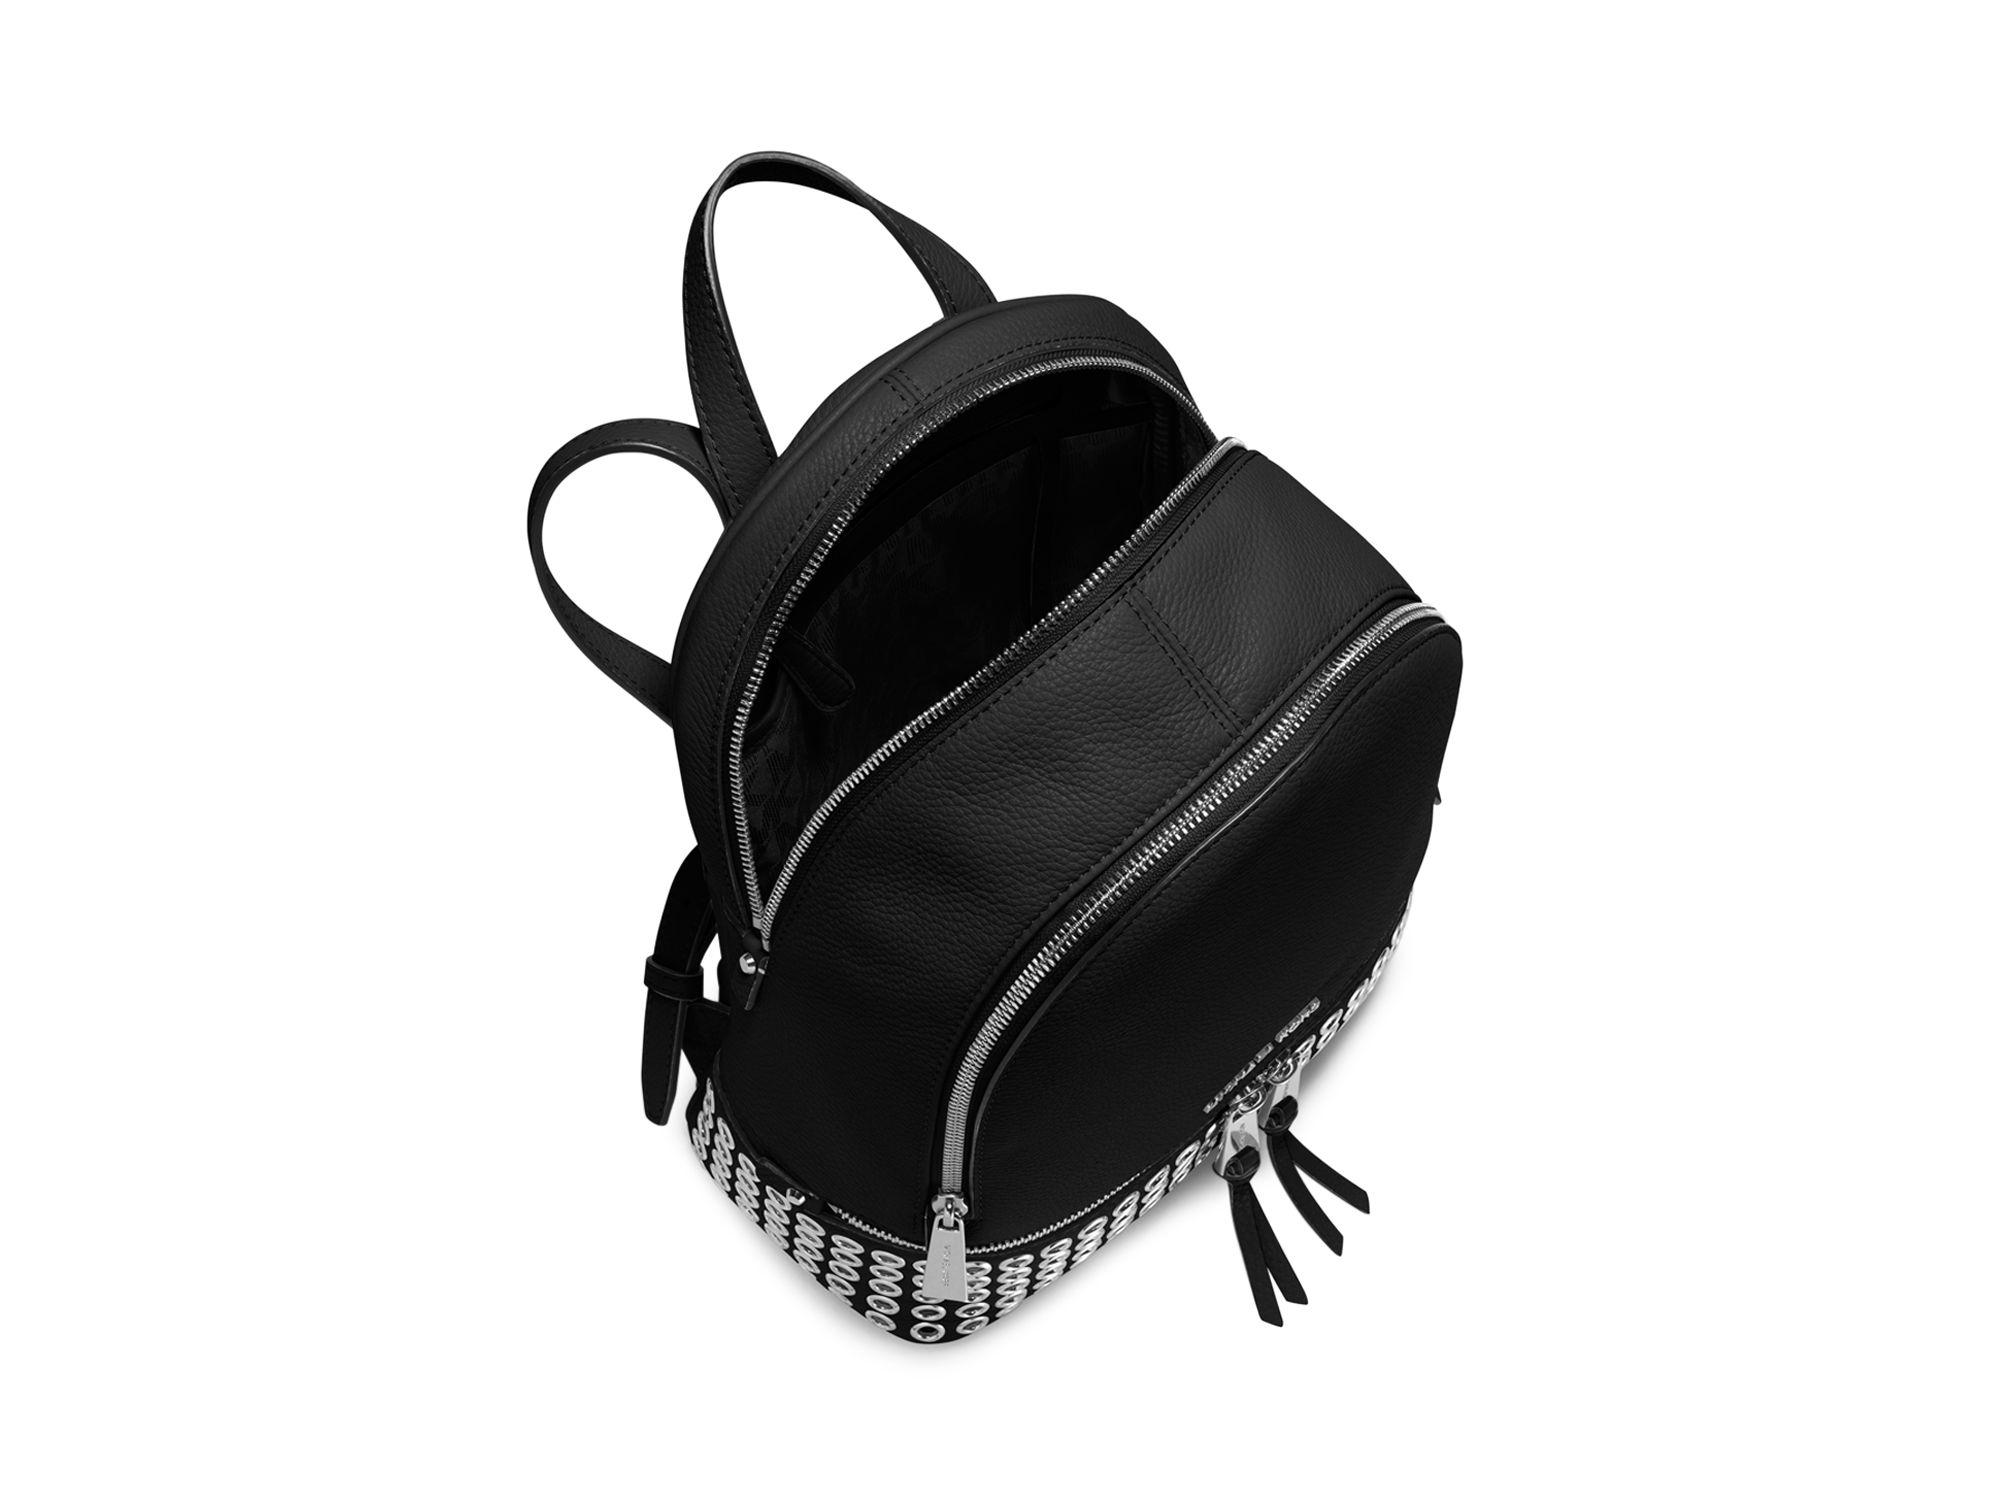 9ee6f29e010e9 Lyst - MICHAEL Michael Kors Medium Rhea Zip Grommet Backpack in Black